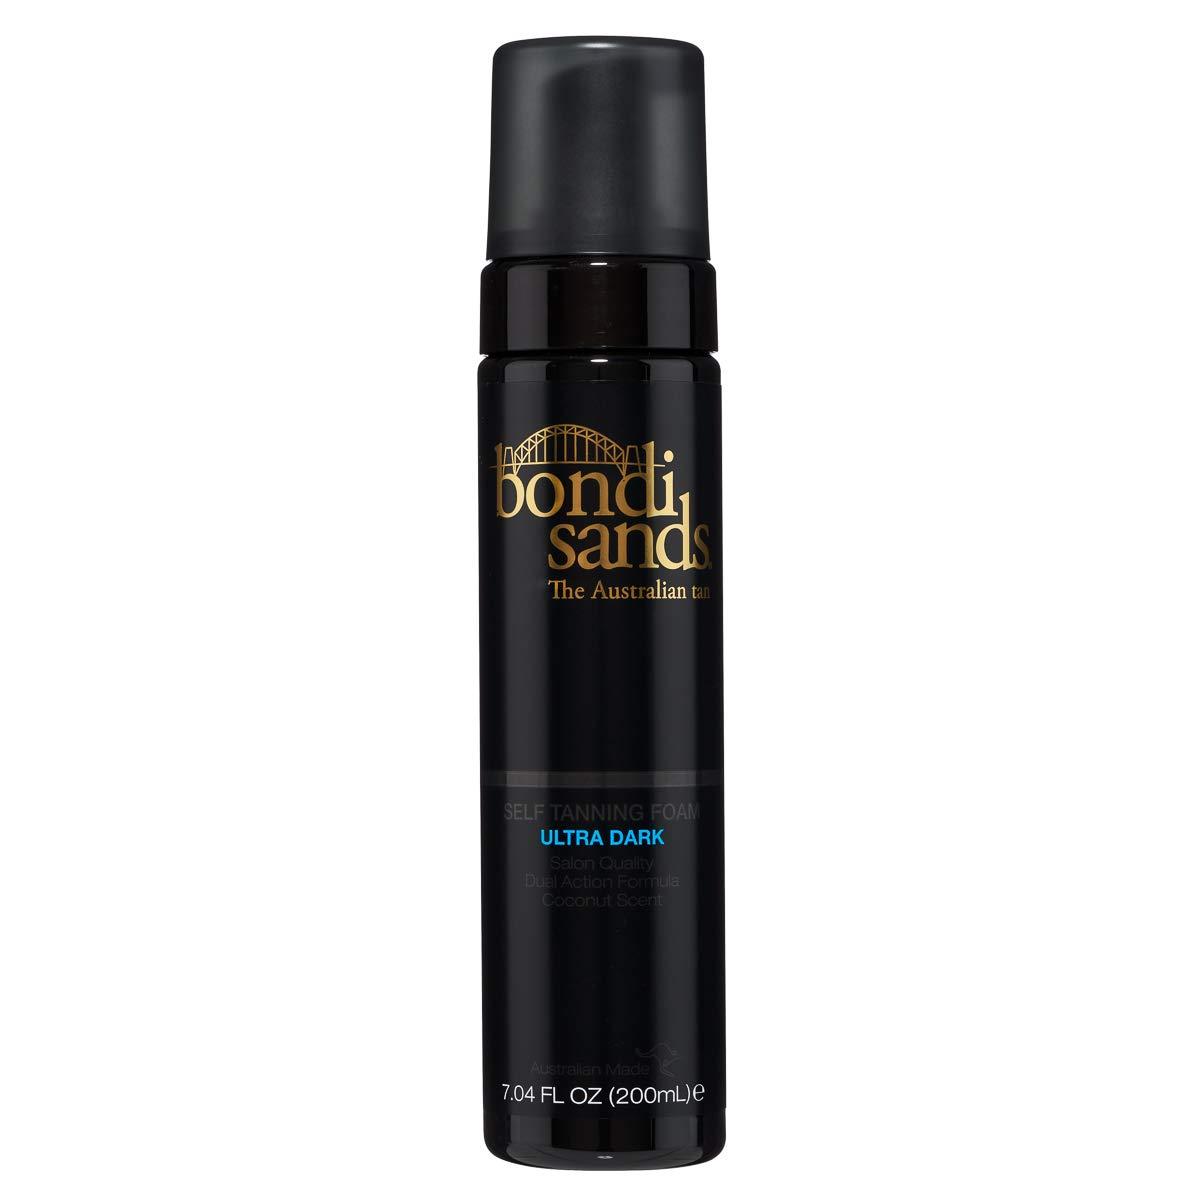 Bondi Sands Self Tanner Ultra Dark Foam- Self Tanner Mousse for Quick Sunless Tanning - Use For A Natural Looking Australian Golden Tan (7.04 FL OZ)